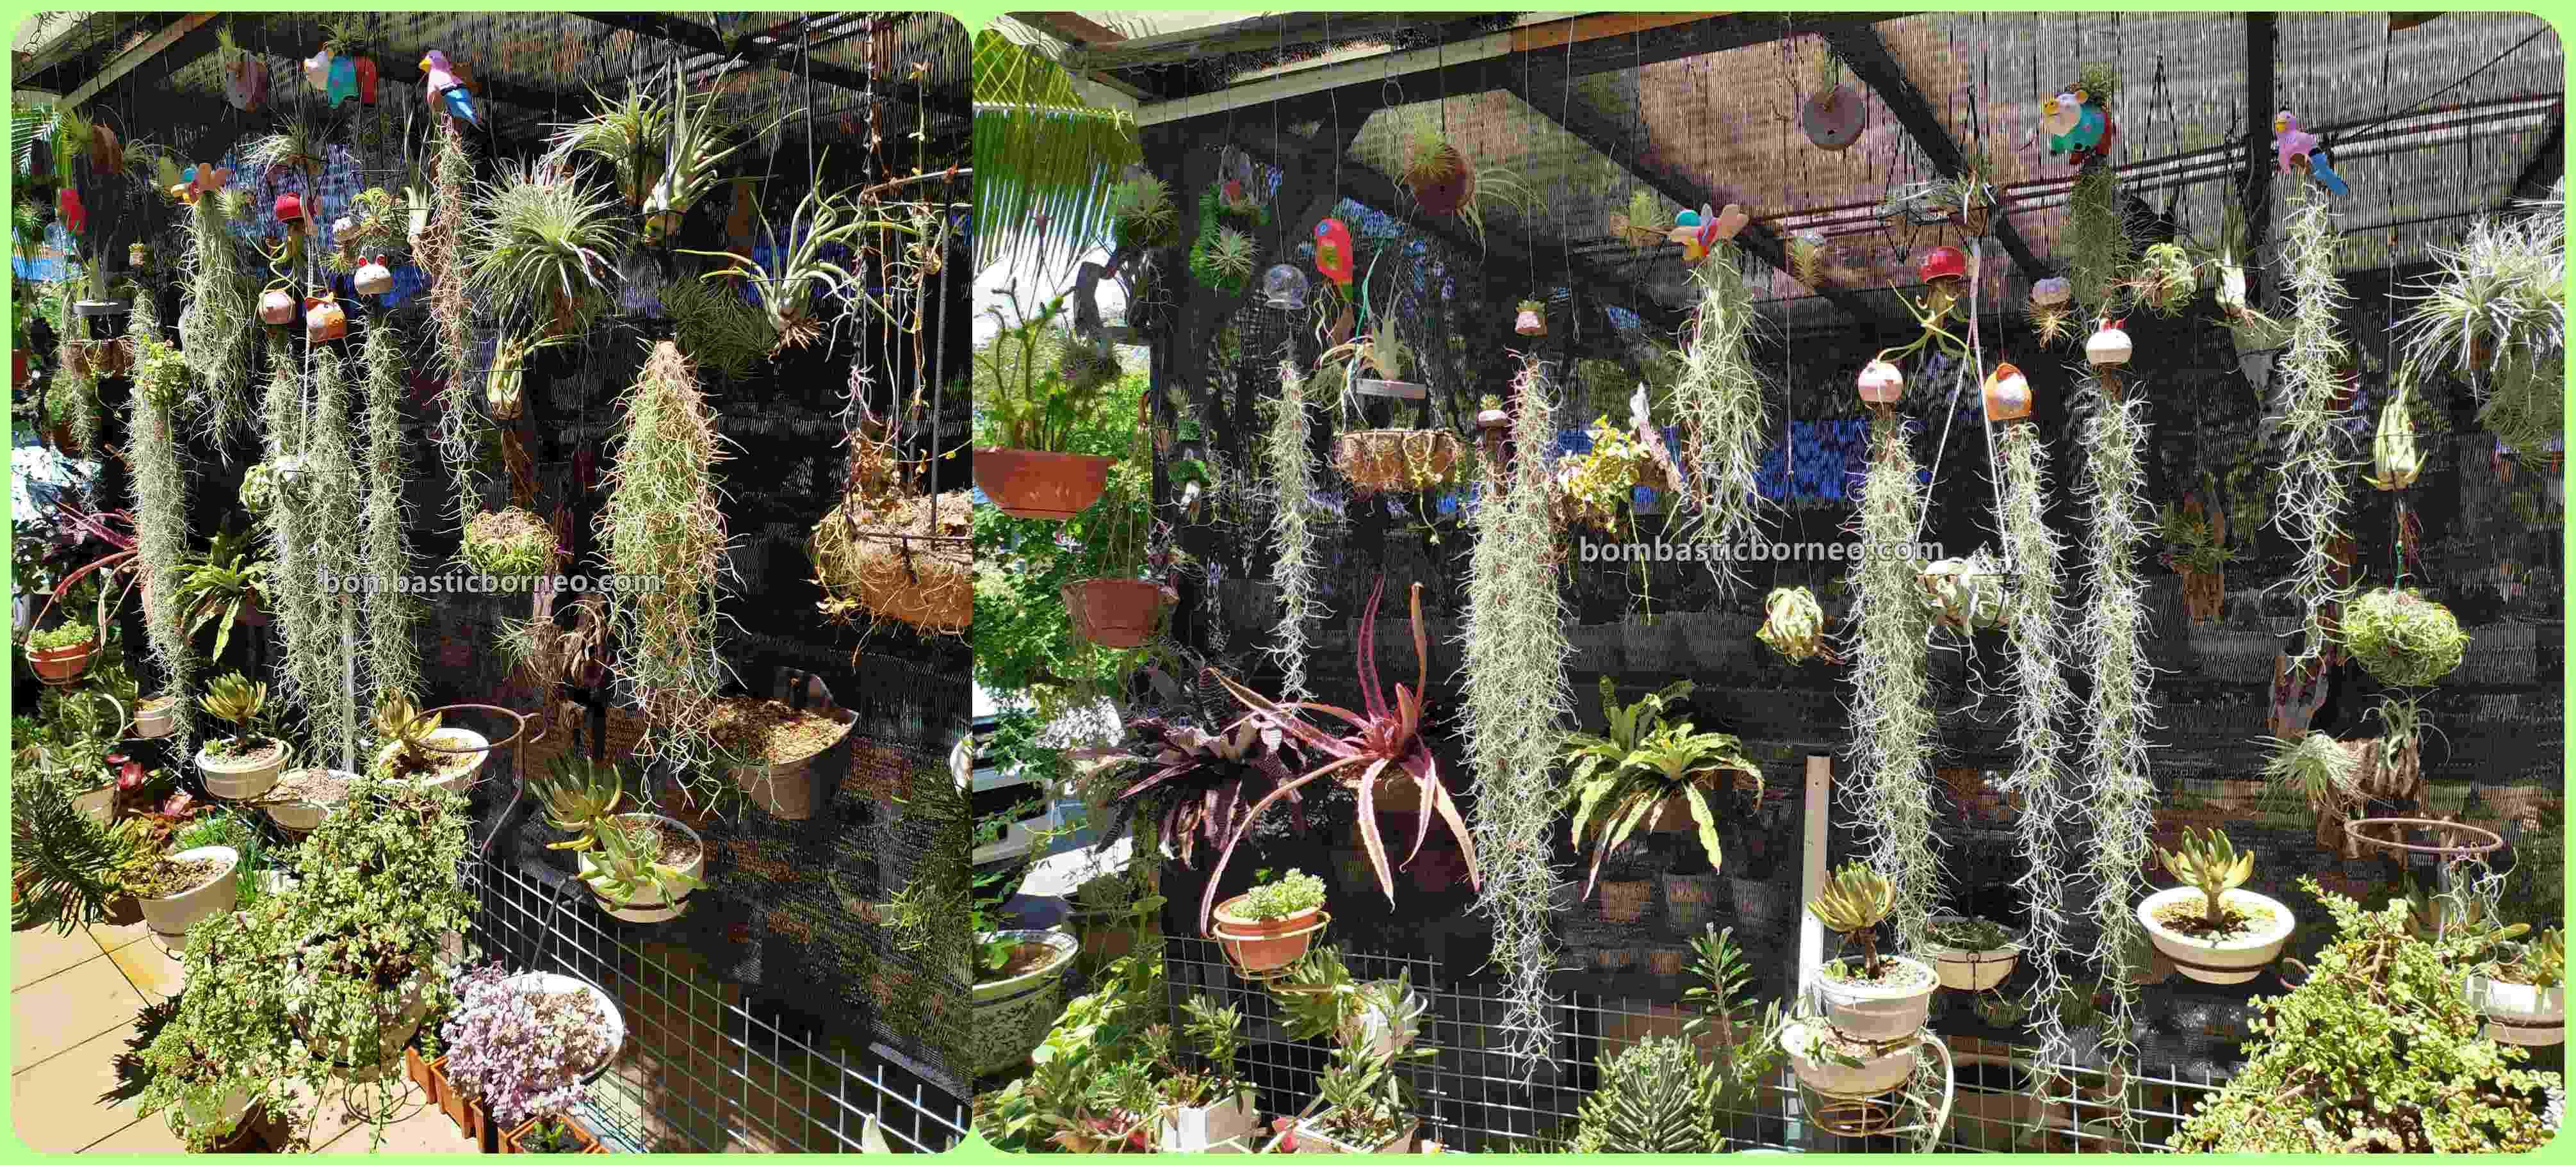 LS Succulent Garden, Succulents, cacti, Desert Plants, botany, flora, nature, exploration, hobby, Tourism, tourist attraction, Trans Borneo, 探索婆罗洲马来西亚, 砂拉越美里嗜好, 肉肉仙人掌植物